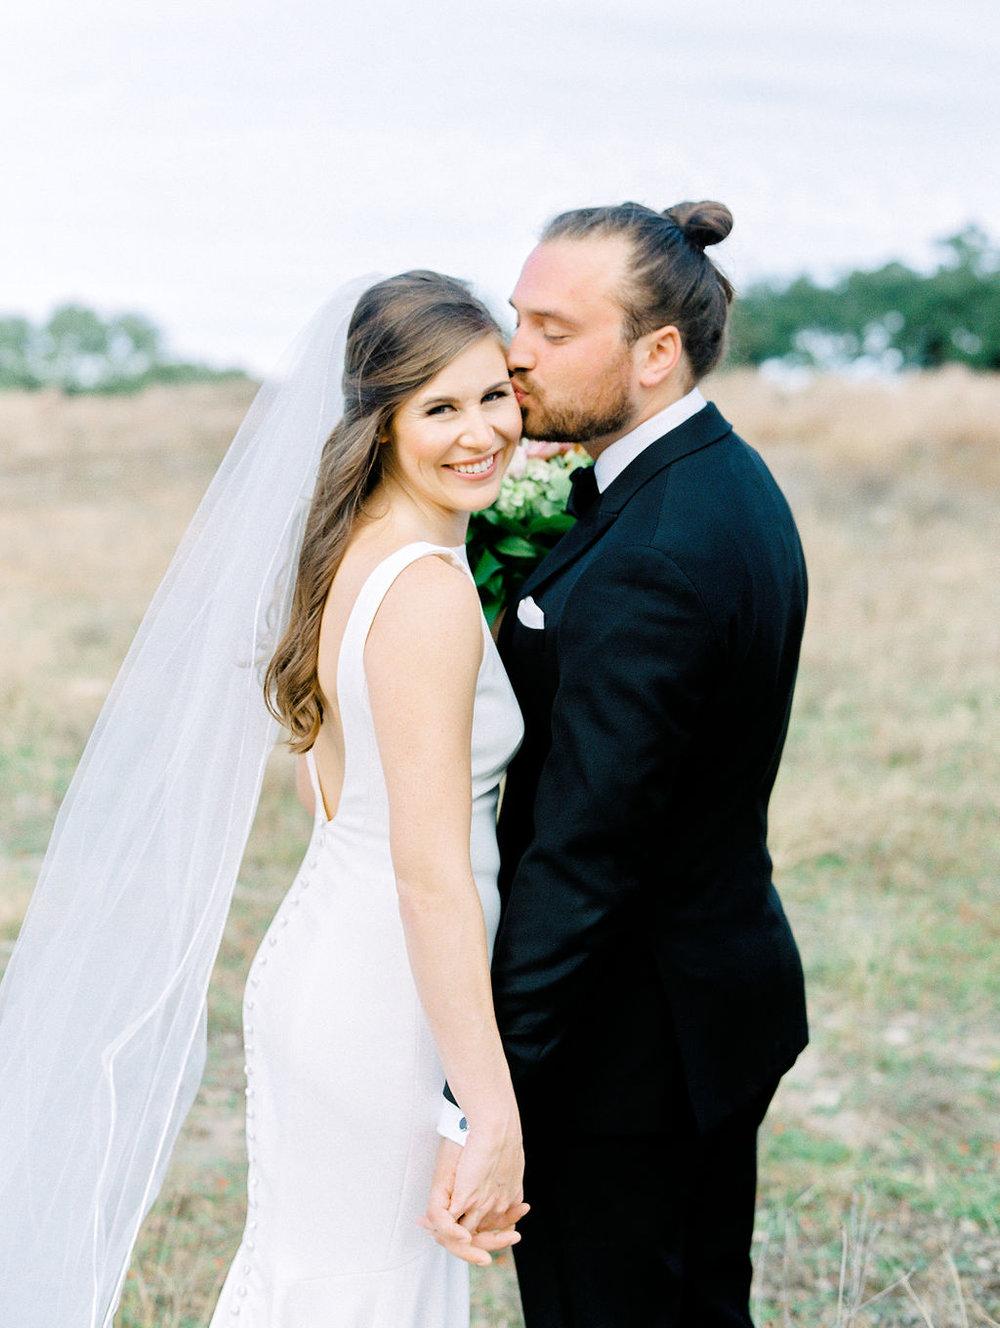 Austin-Texas-Wedding-Photographer-Addison-Grove-Film-46.jpg